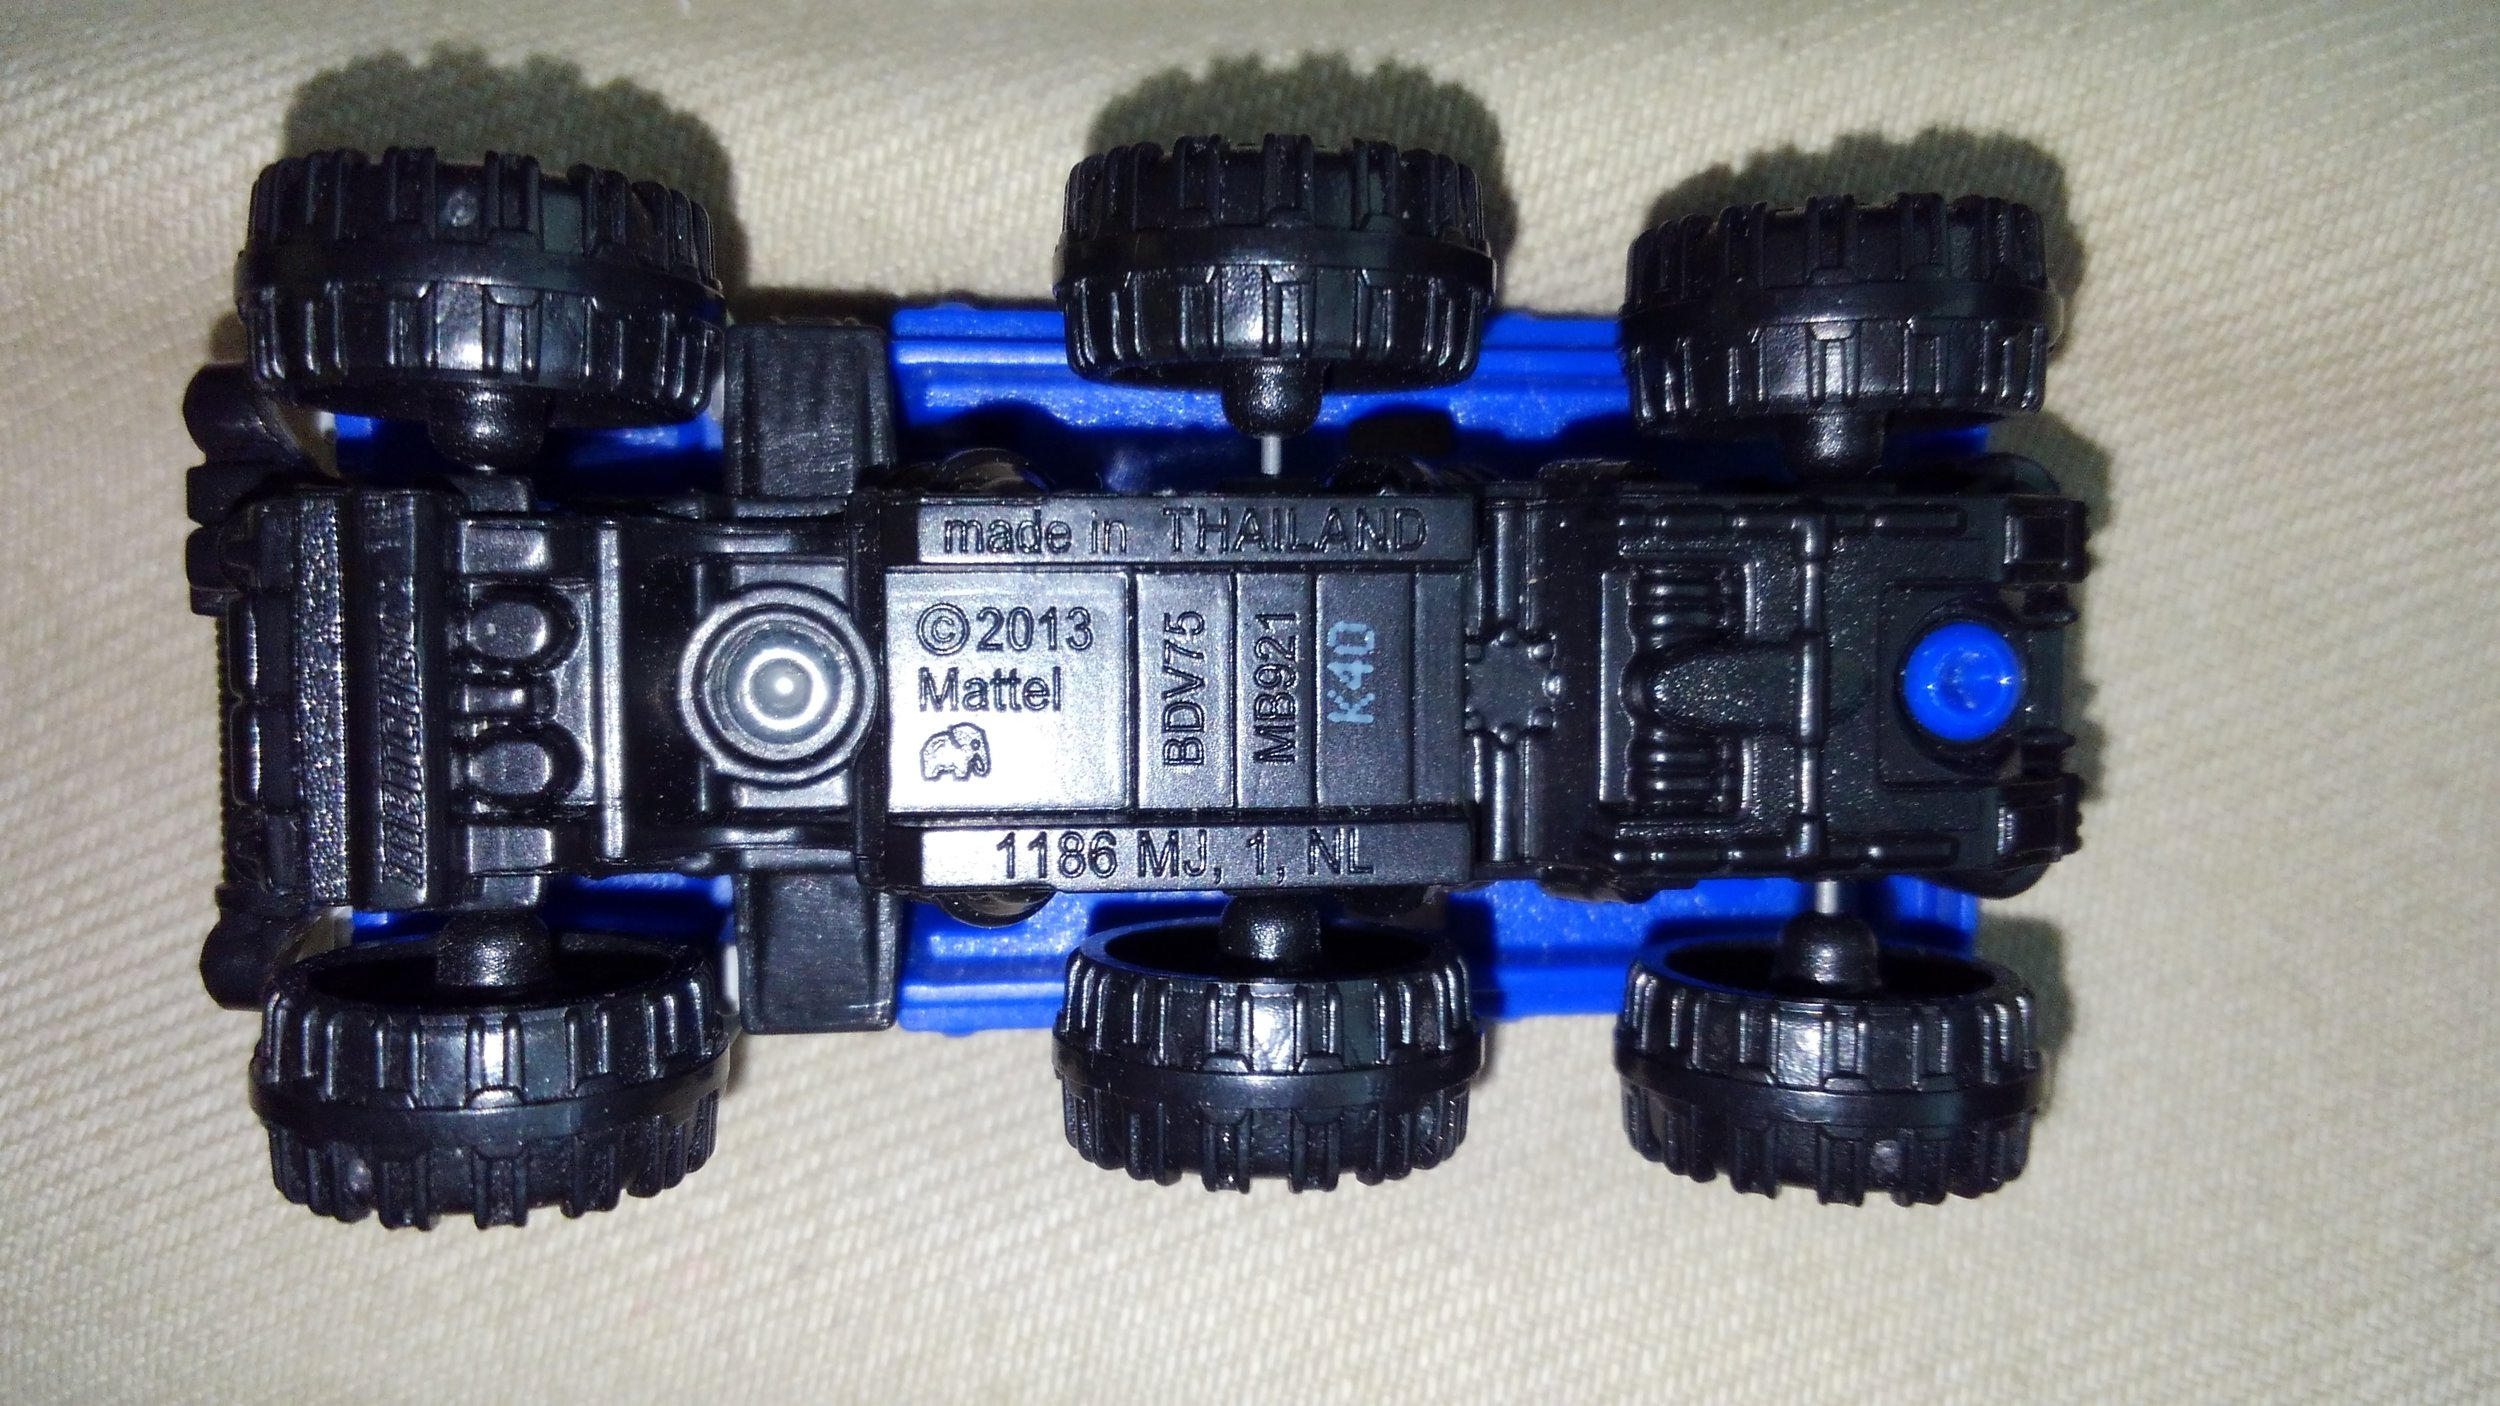 KIMG0223.JPG